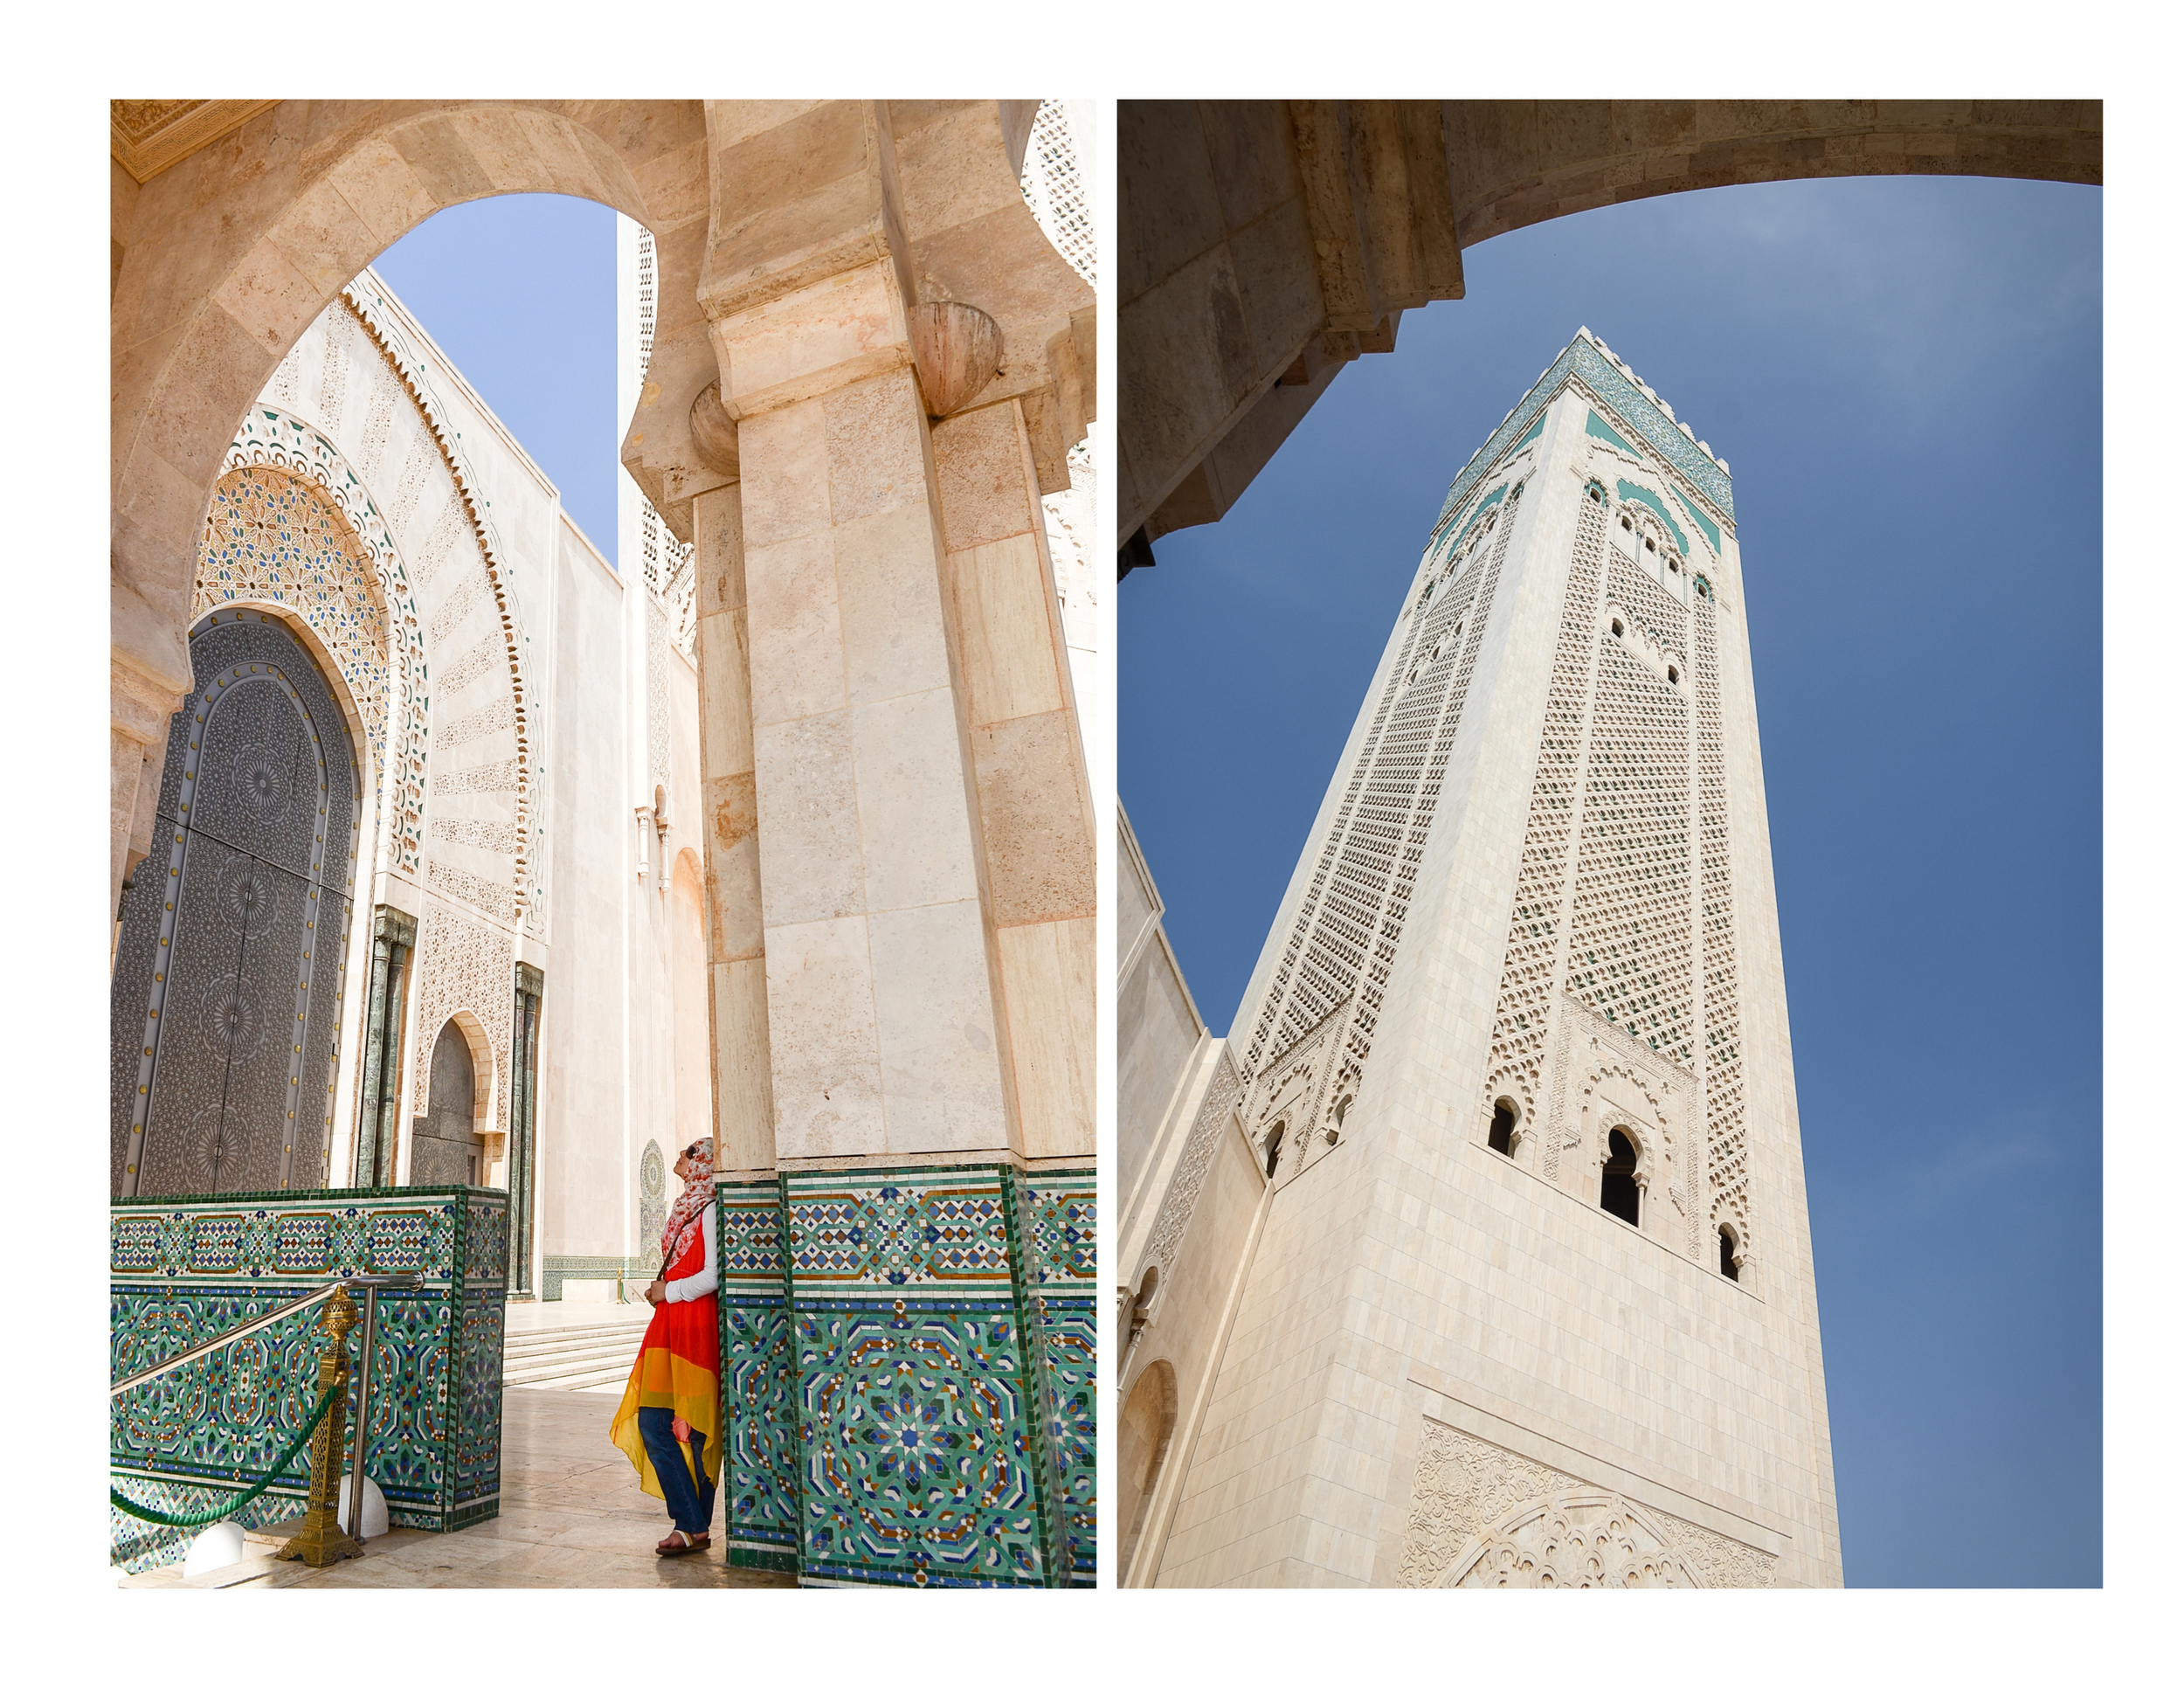 Casablanca - batoul standing